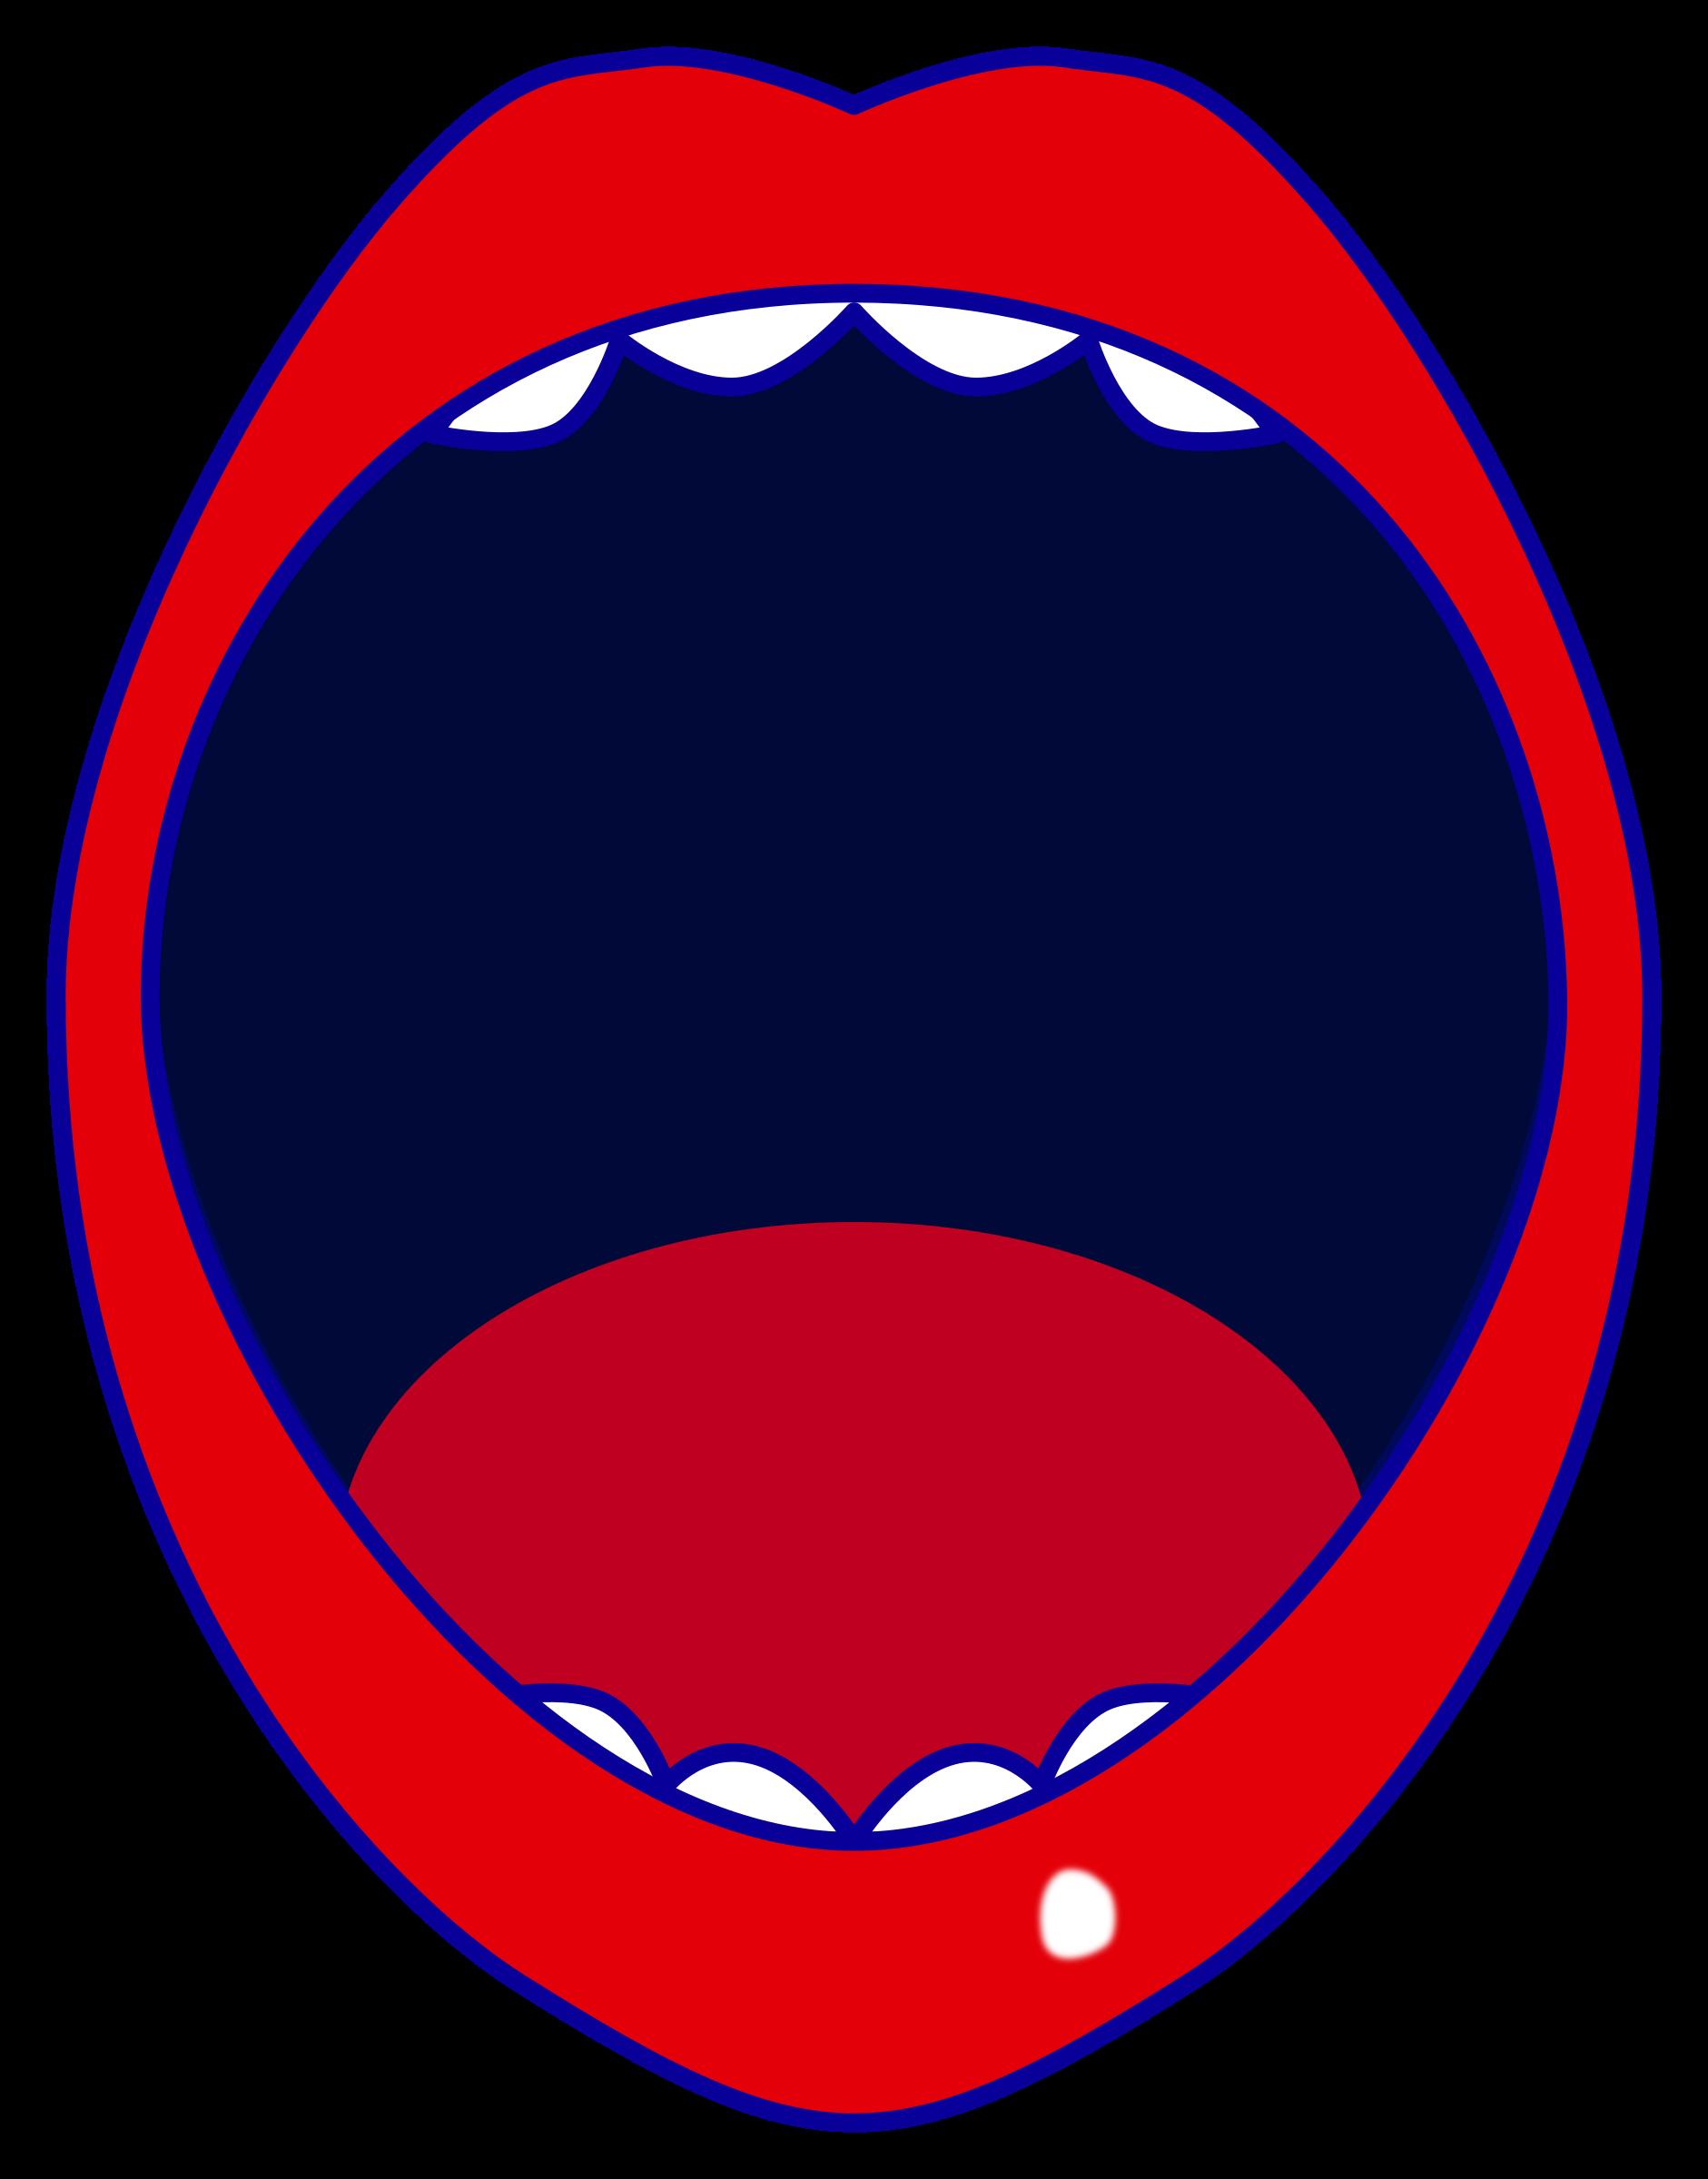 Clipart Red Open Mouth-Clipart red open mouth-3